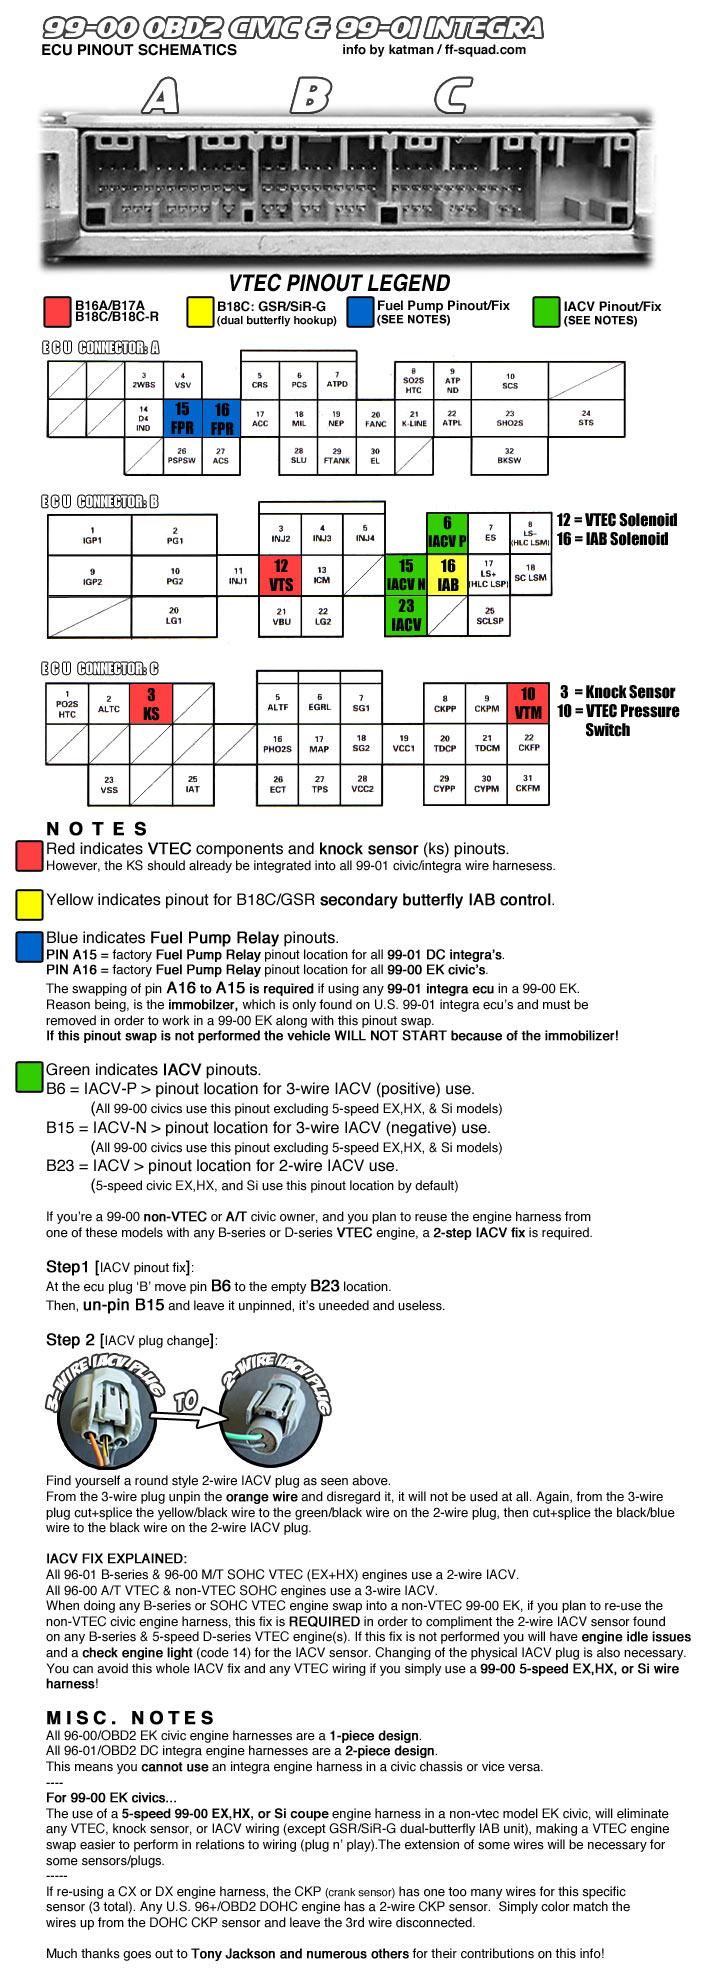 H22 Wiring Diagram H22 Engine Harness Diagram • Googlea4.com on